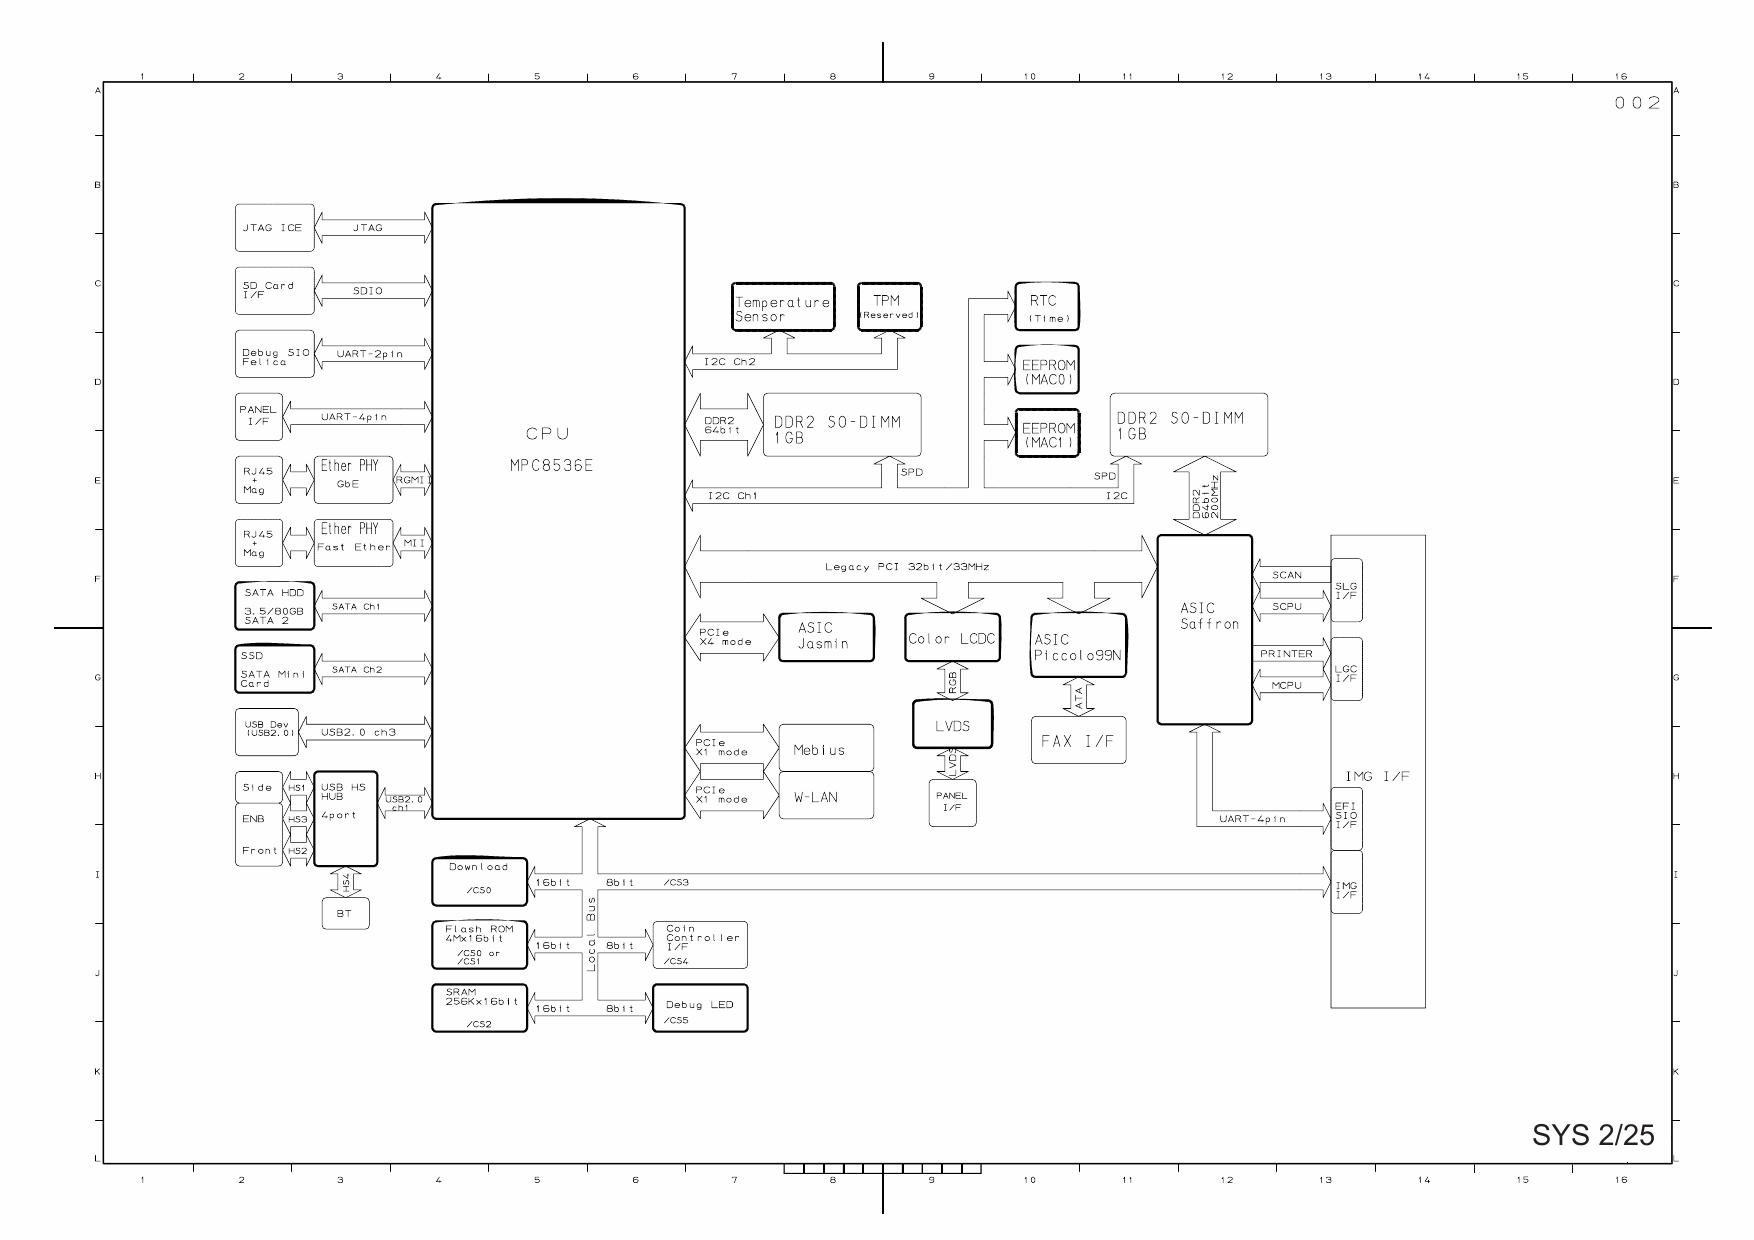 toshiba e studio 3540c manual